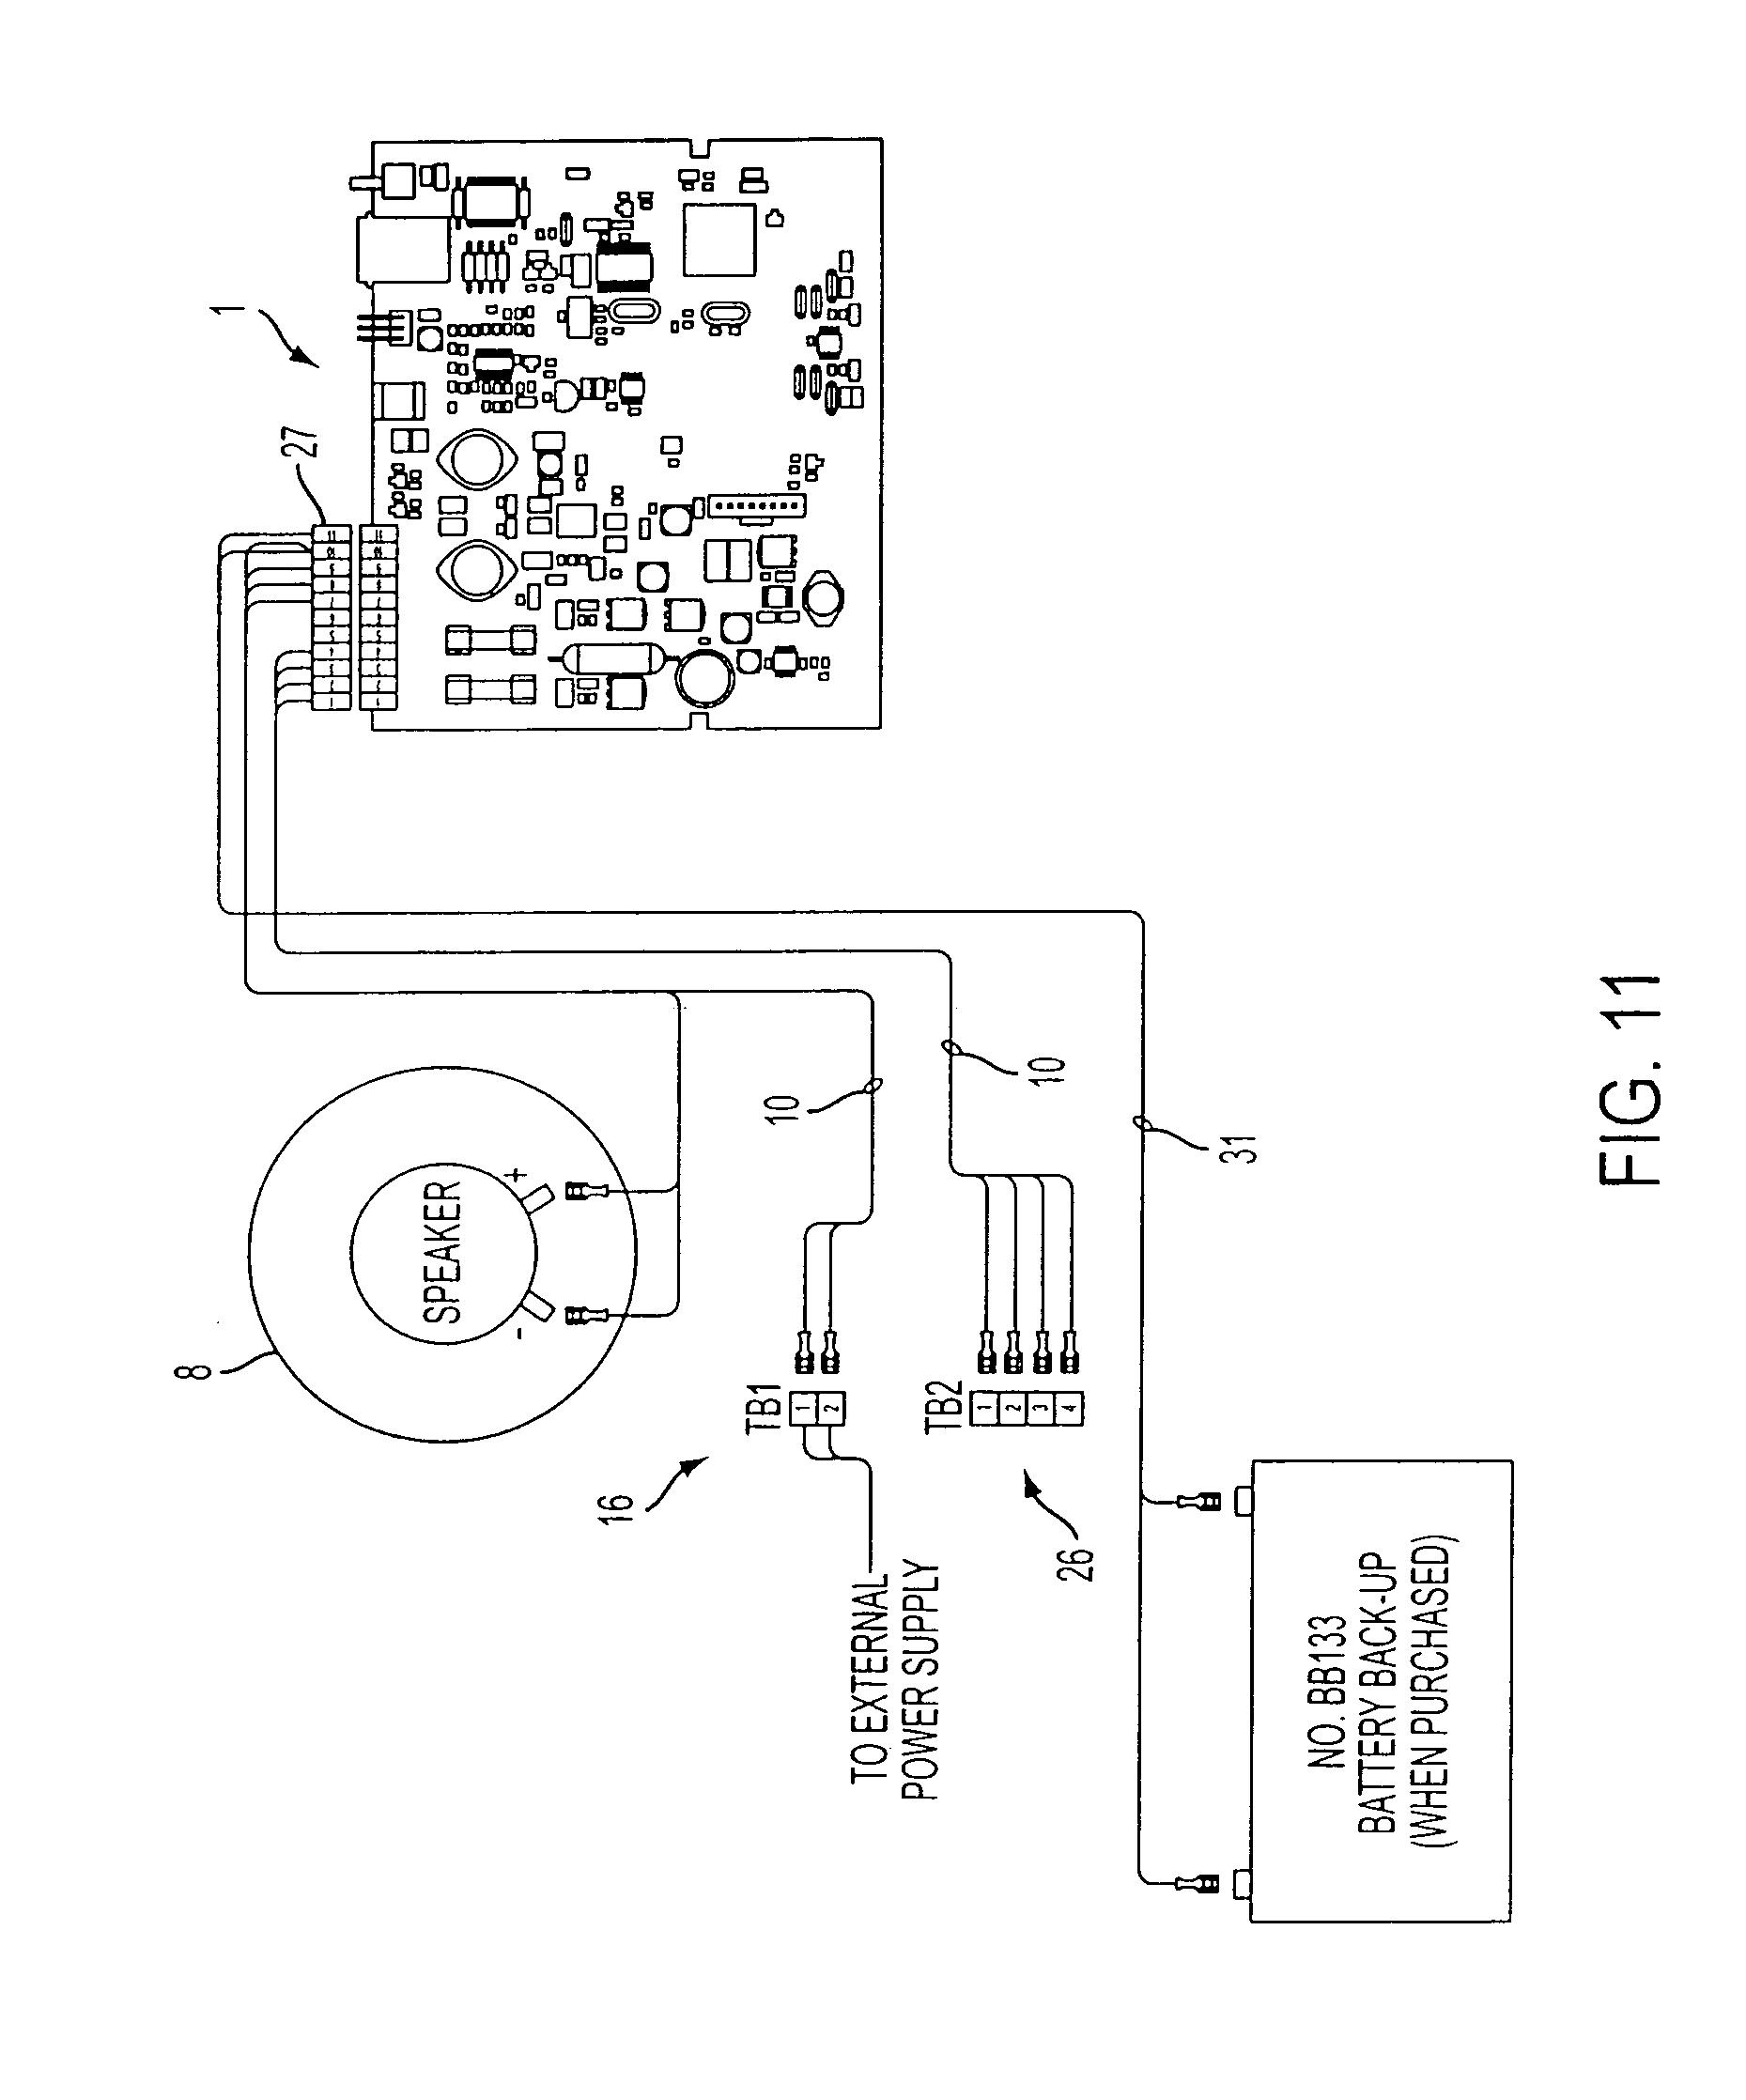 70 Volt Audio System Wiring Diagram. Diagram. Auto Wiring